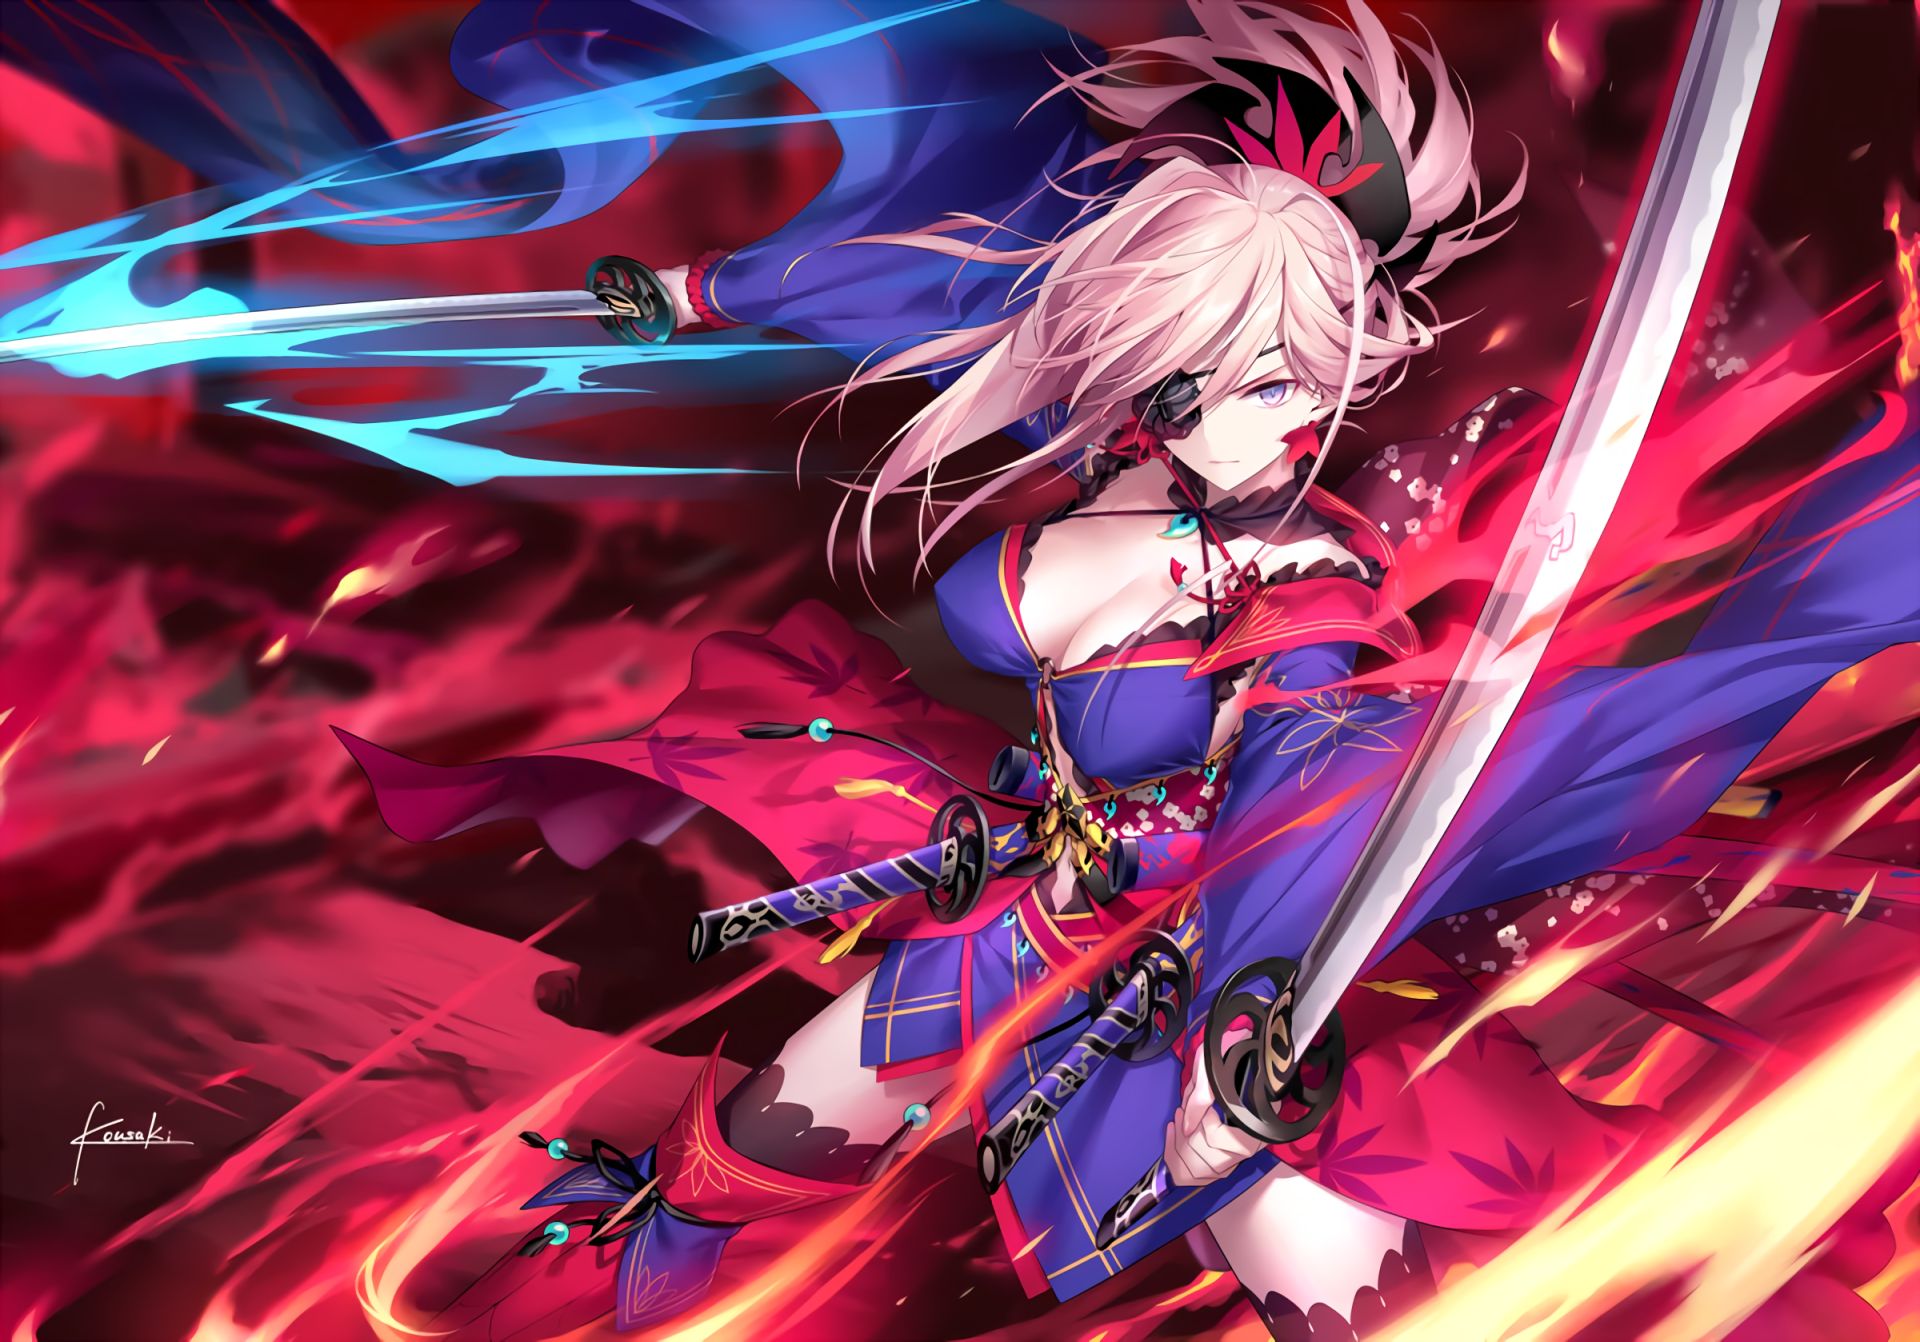 32 Miyamoto Musashi Hd Wallpapers Background Images Wallpaper Abyss